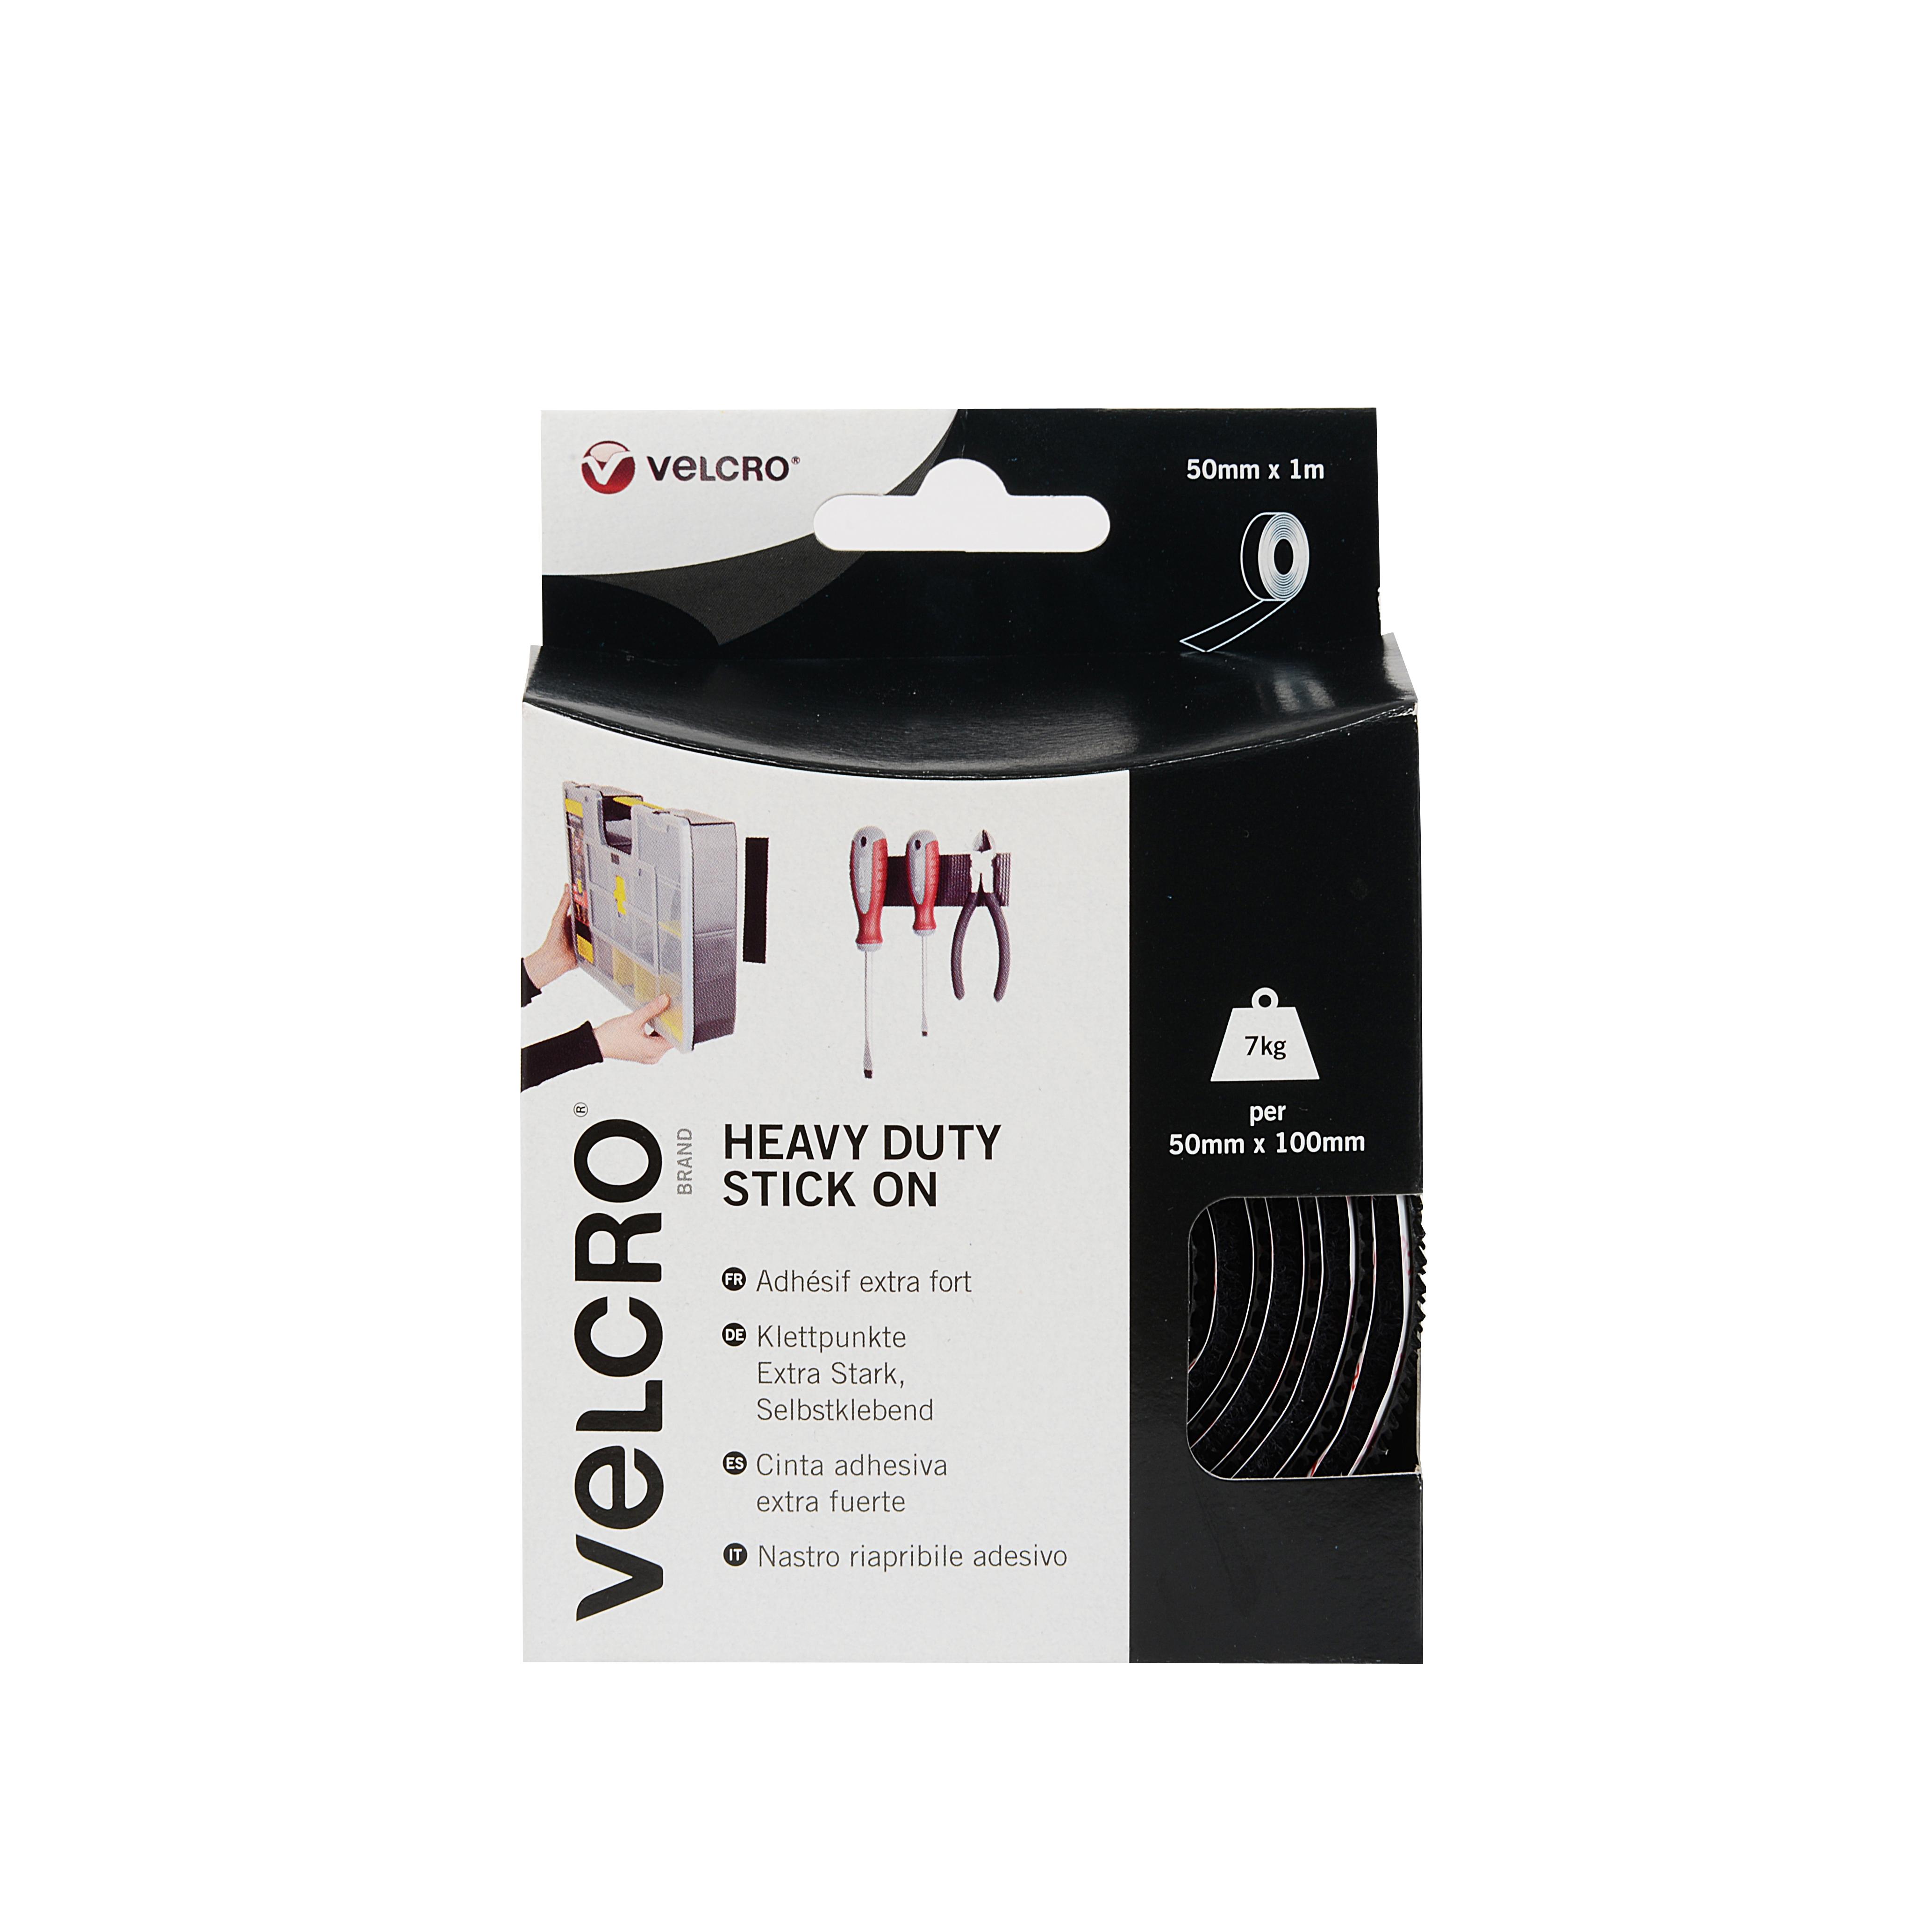 VELCRO® Brand Heavy Duty Stick On Tape 50mm x 1m black